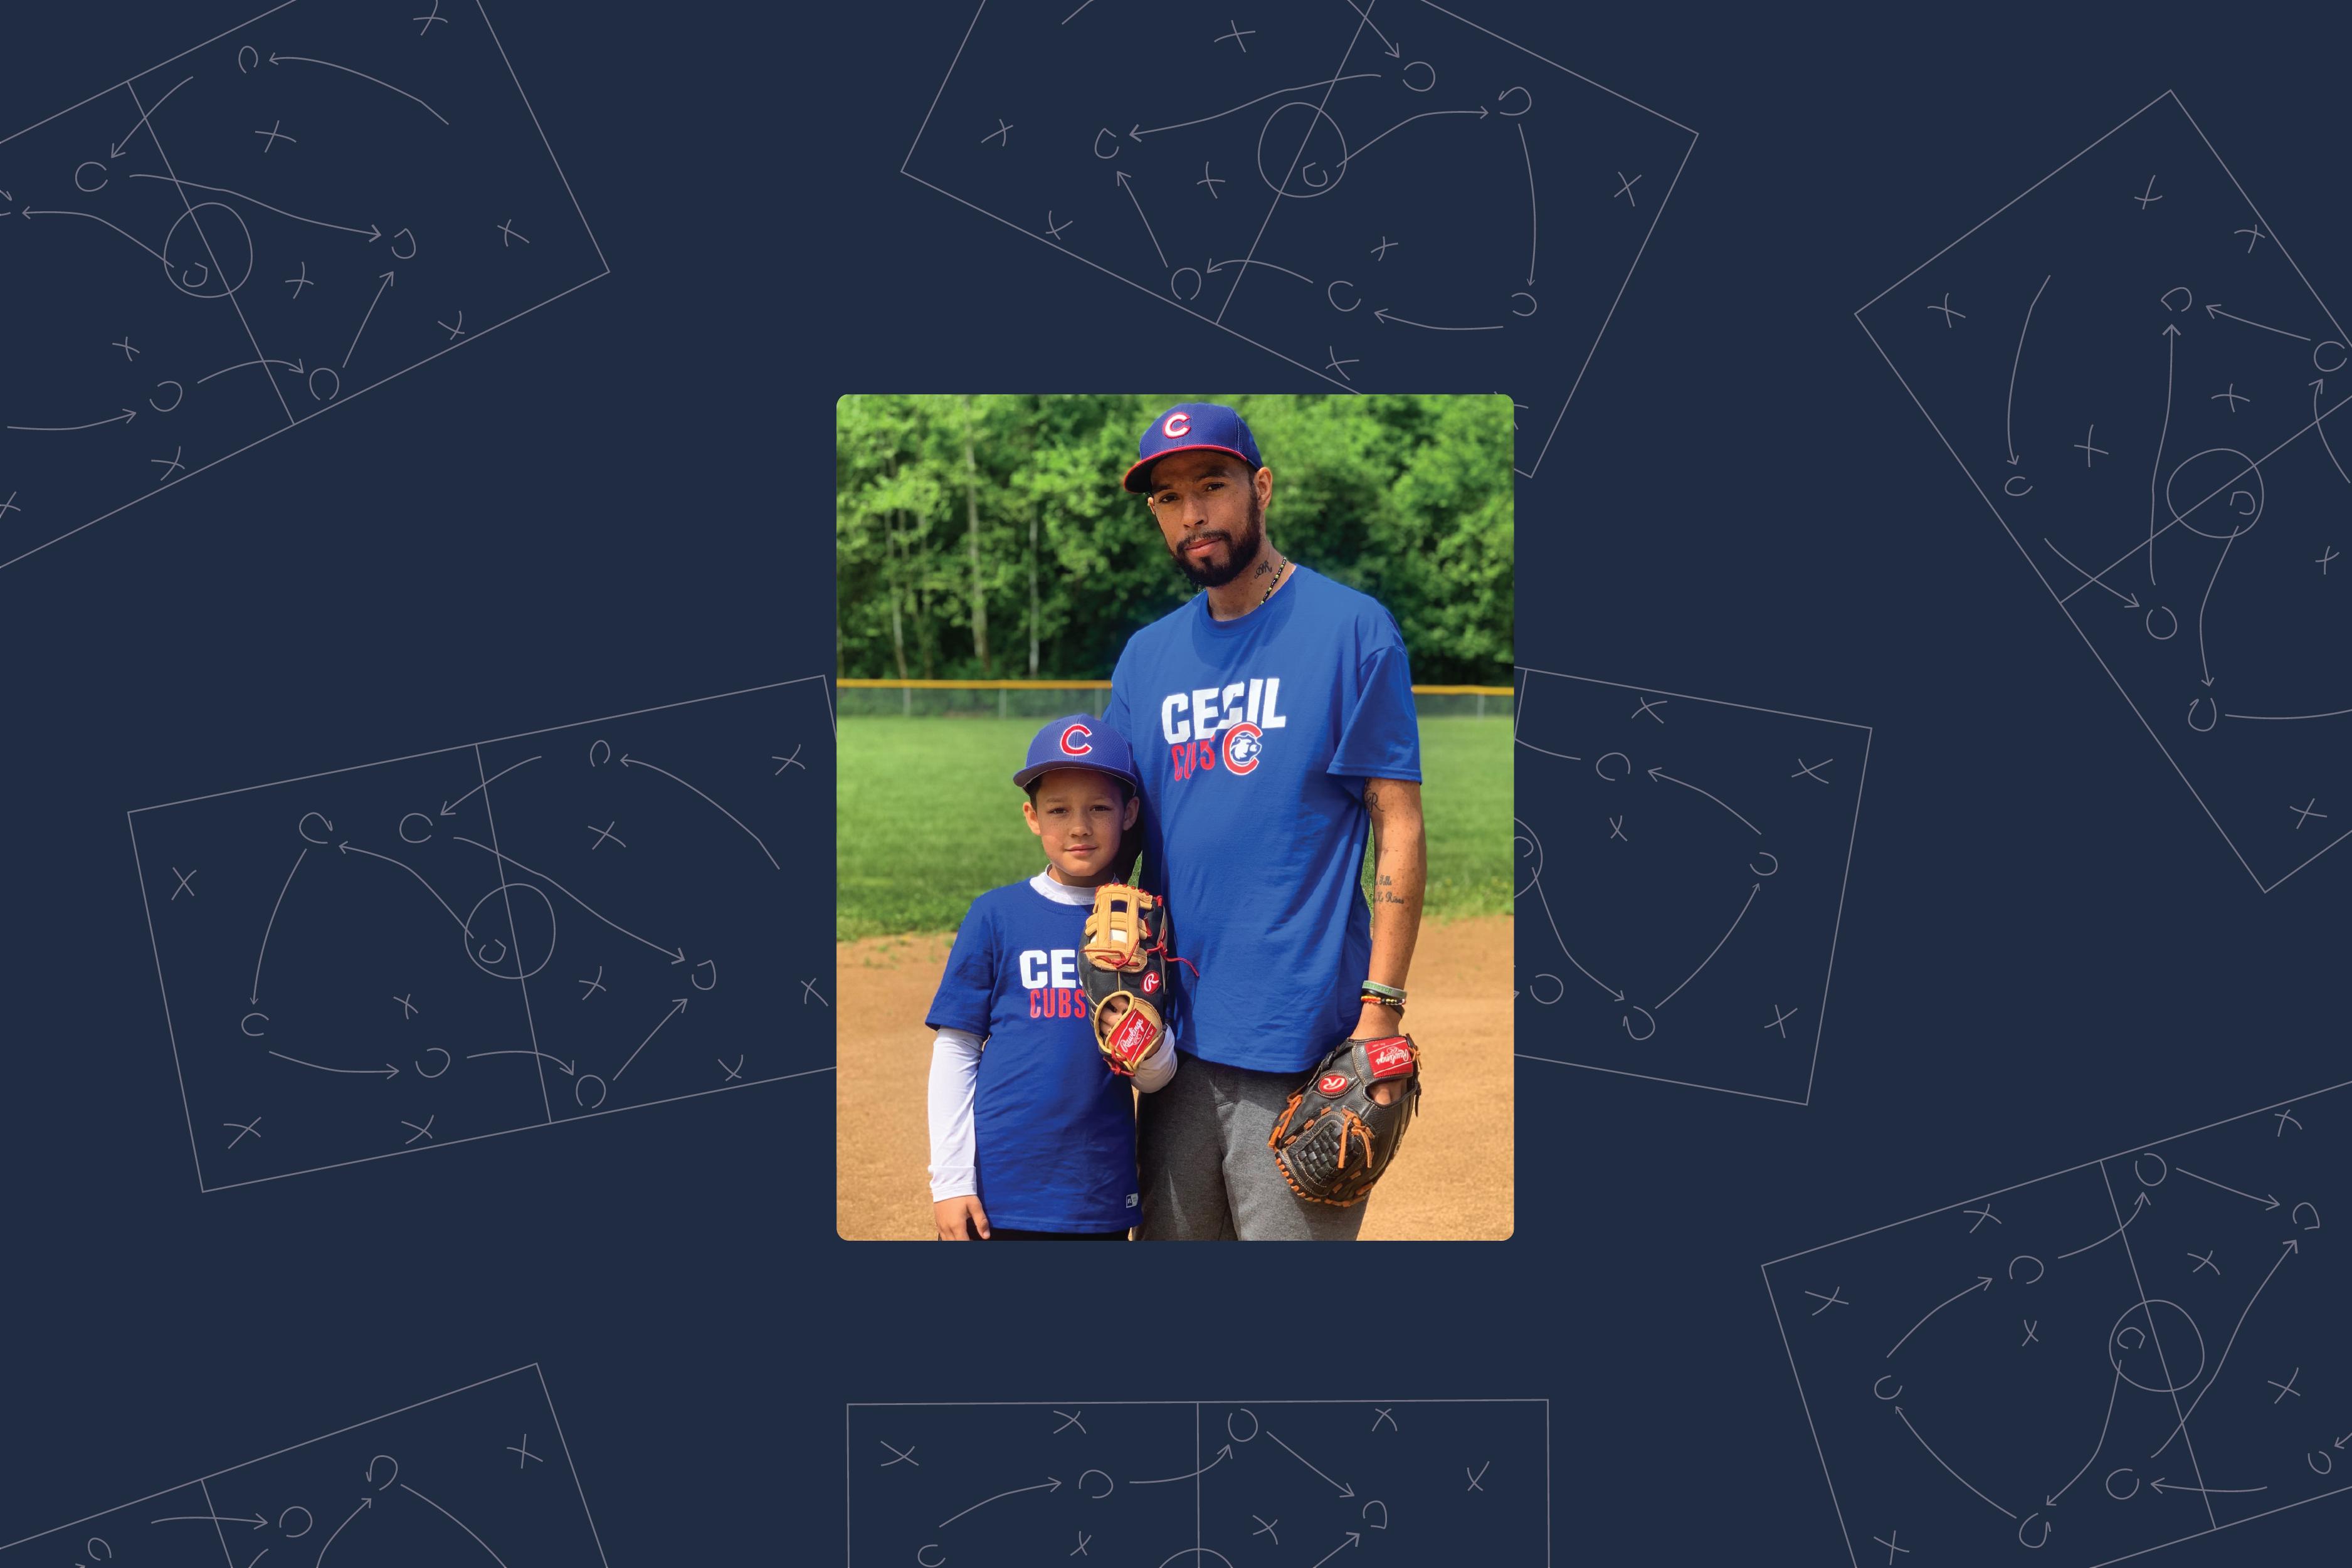 SquadLocker Coach Of The Year 2019 Finalist: Aaron Rouselle